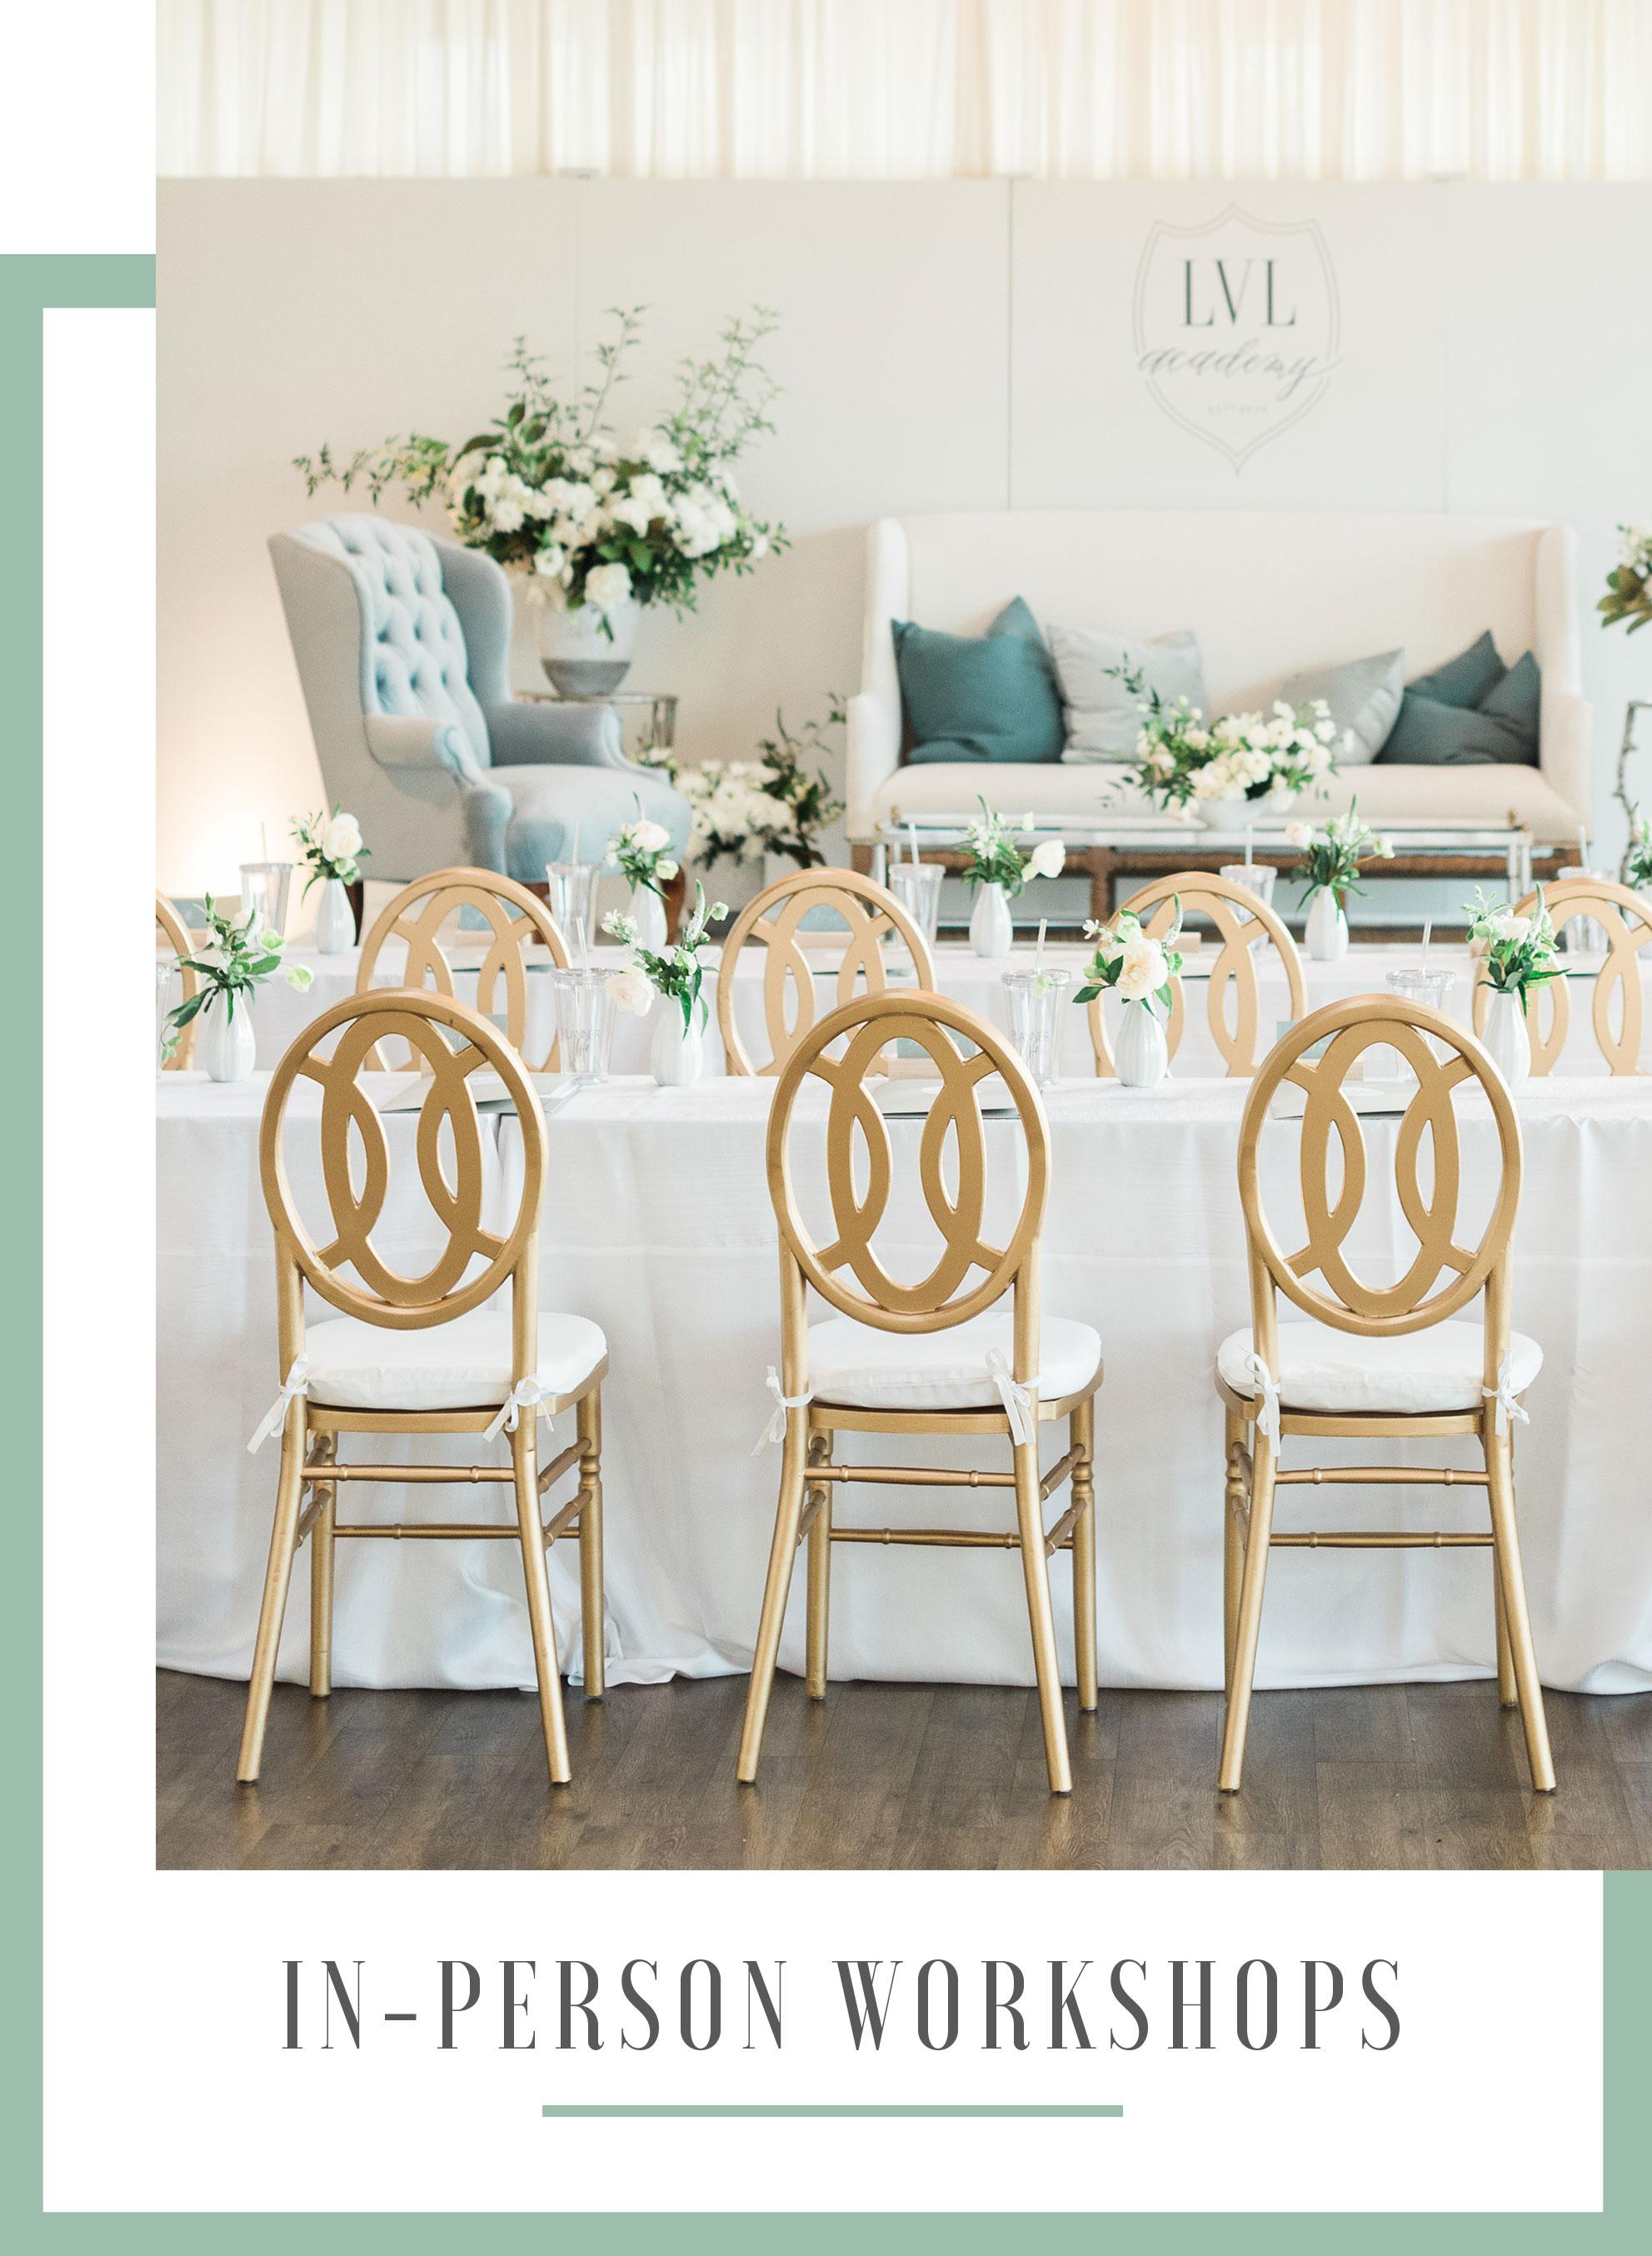 lvl-academy-wedding-planner-workshop.jpg